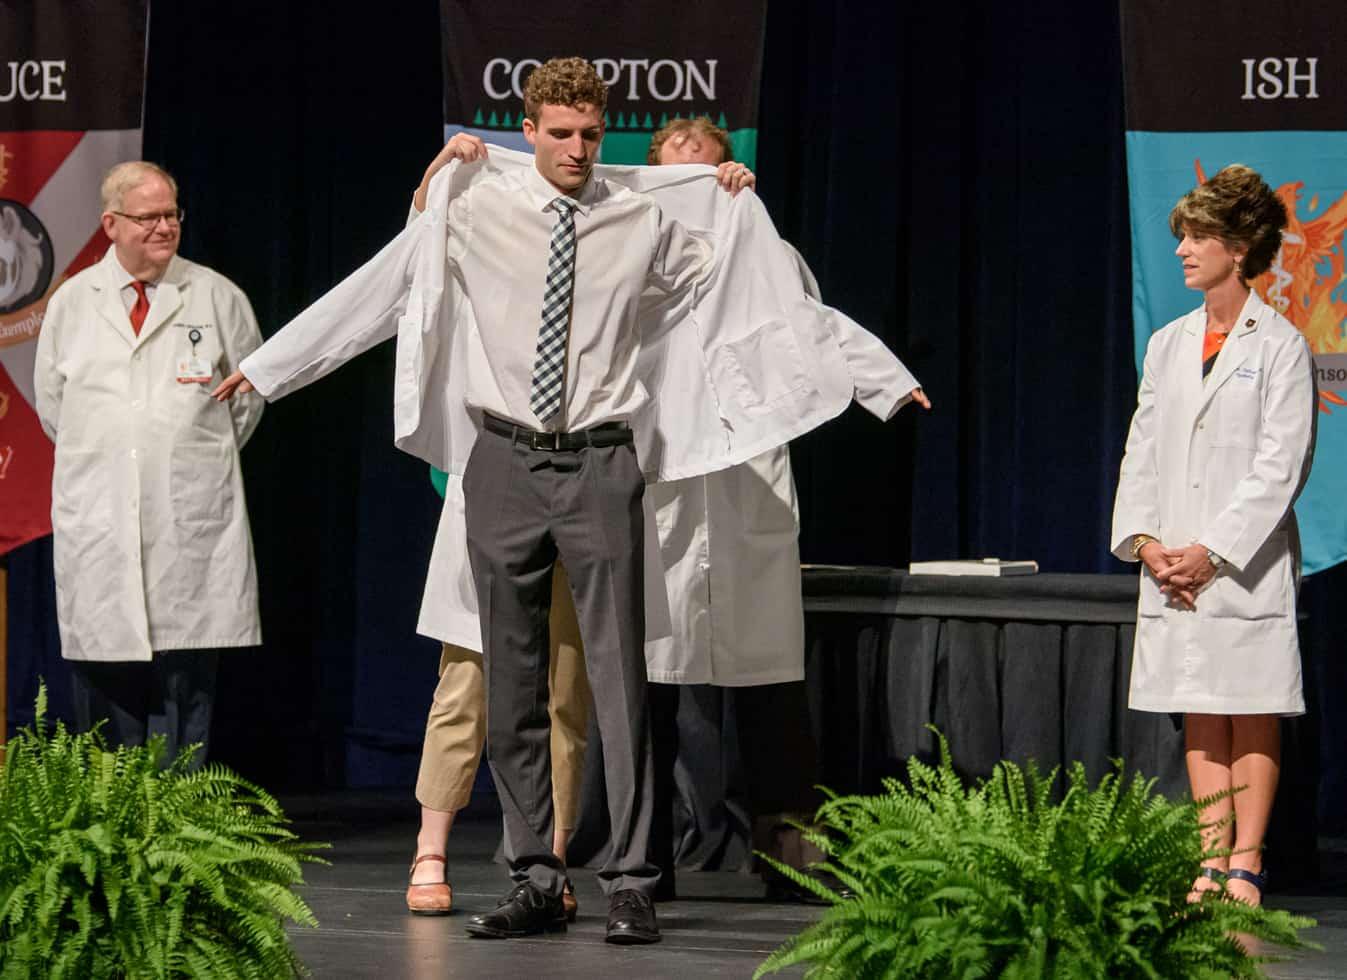 Student putting on white coat